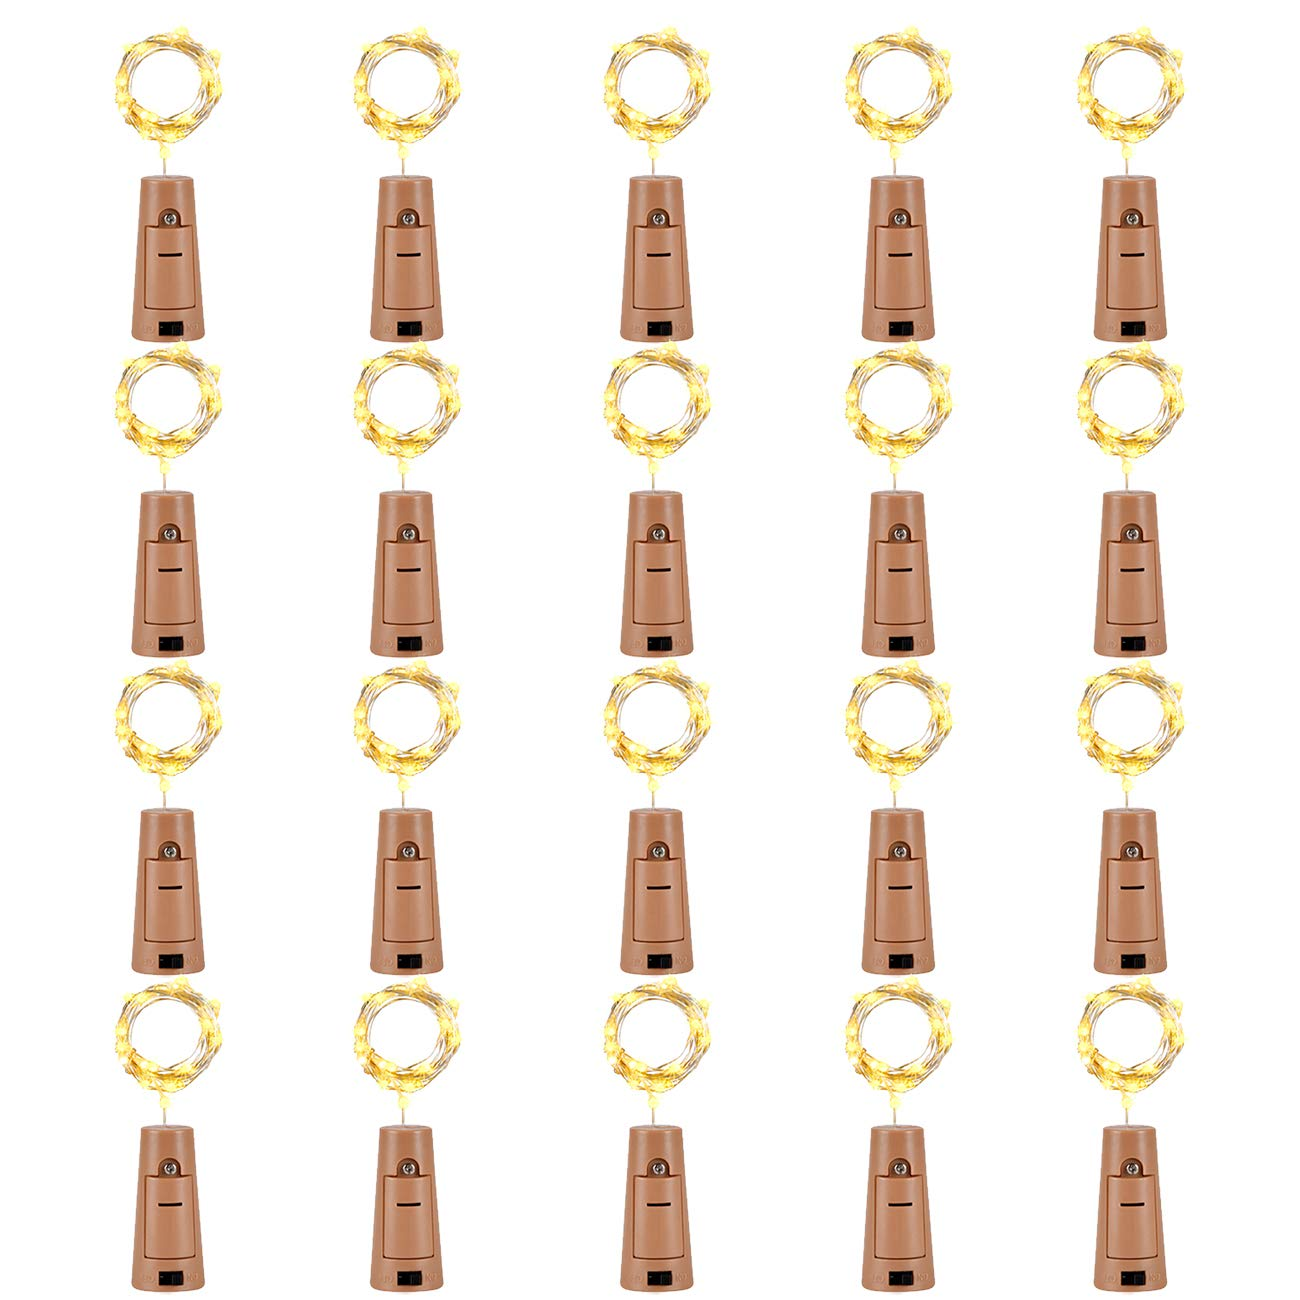 LEDIKON 20 Pack 20 Led Wine Bottle Lights with Cork,3.3Ft Silver Wire Warm White Cork Lights Battery Operated Fairy Mini String Lights for Wedding Party Wine Liquor Bottles Bar Christmas Decor